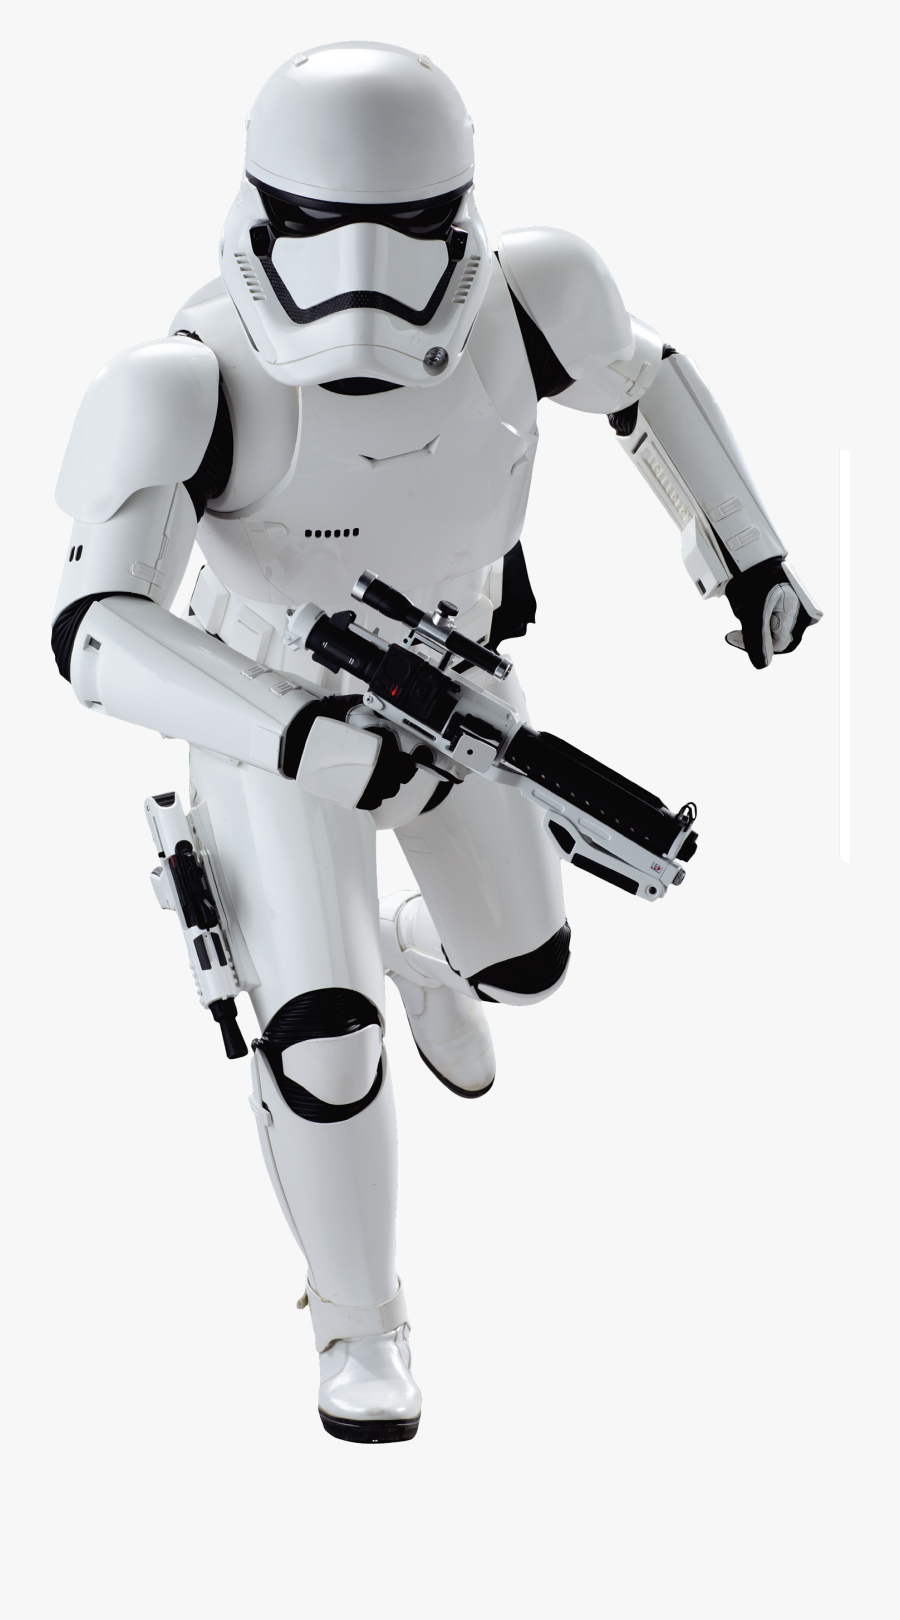 Darth Vader Clipart Storm Trooper - Star Wars Stormtrooper Png, Transparent Clipart